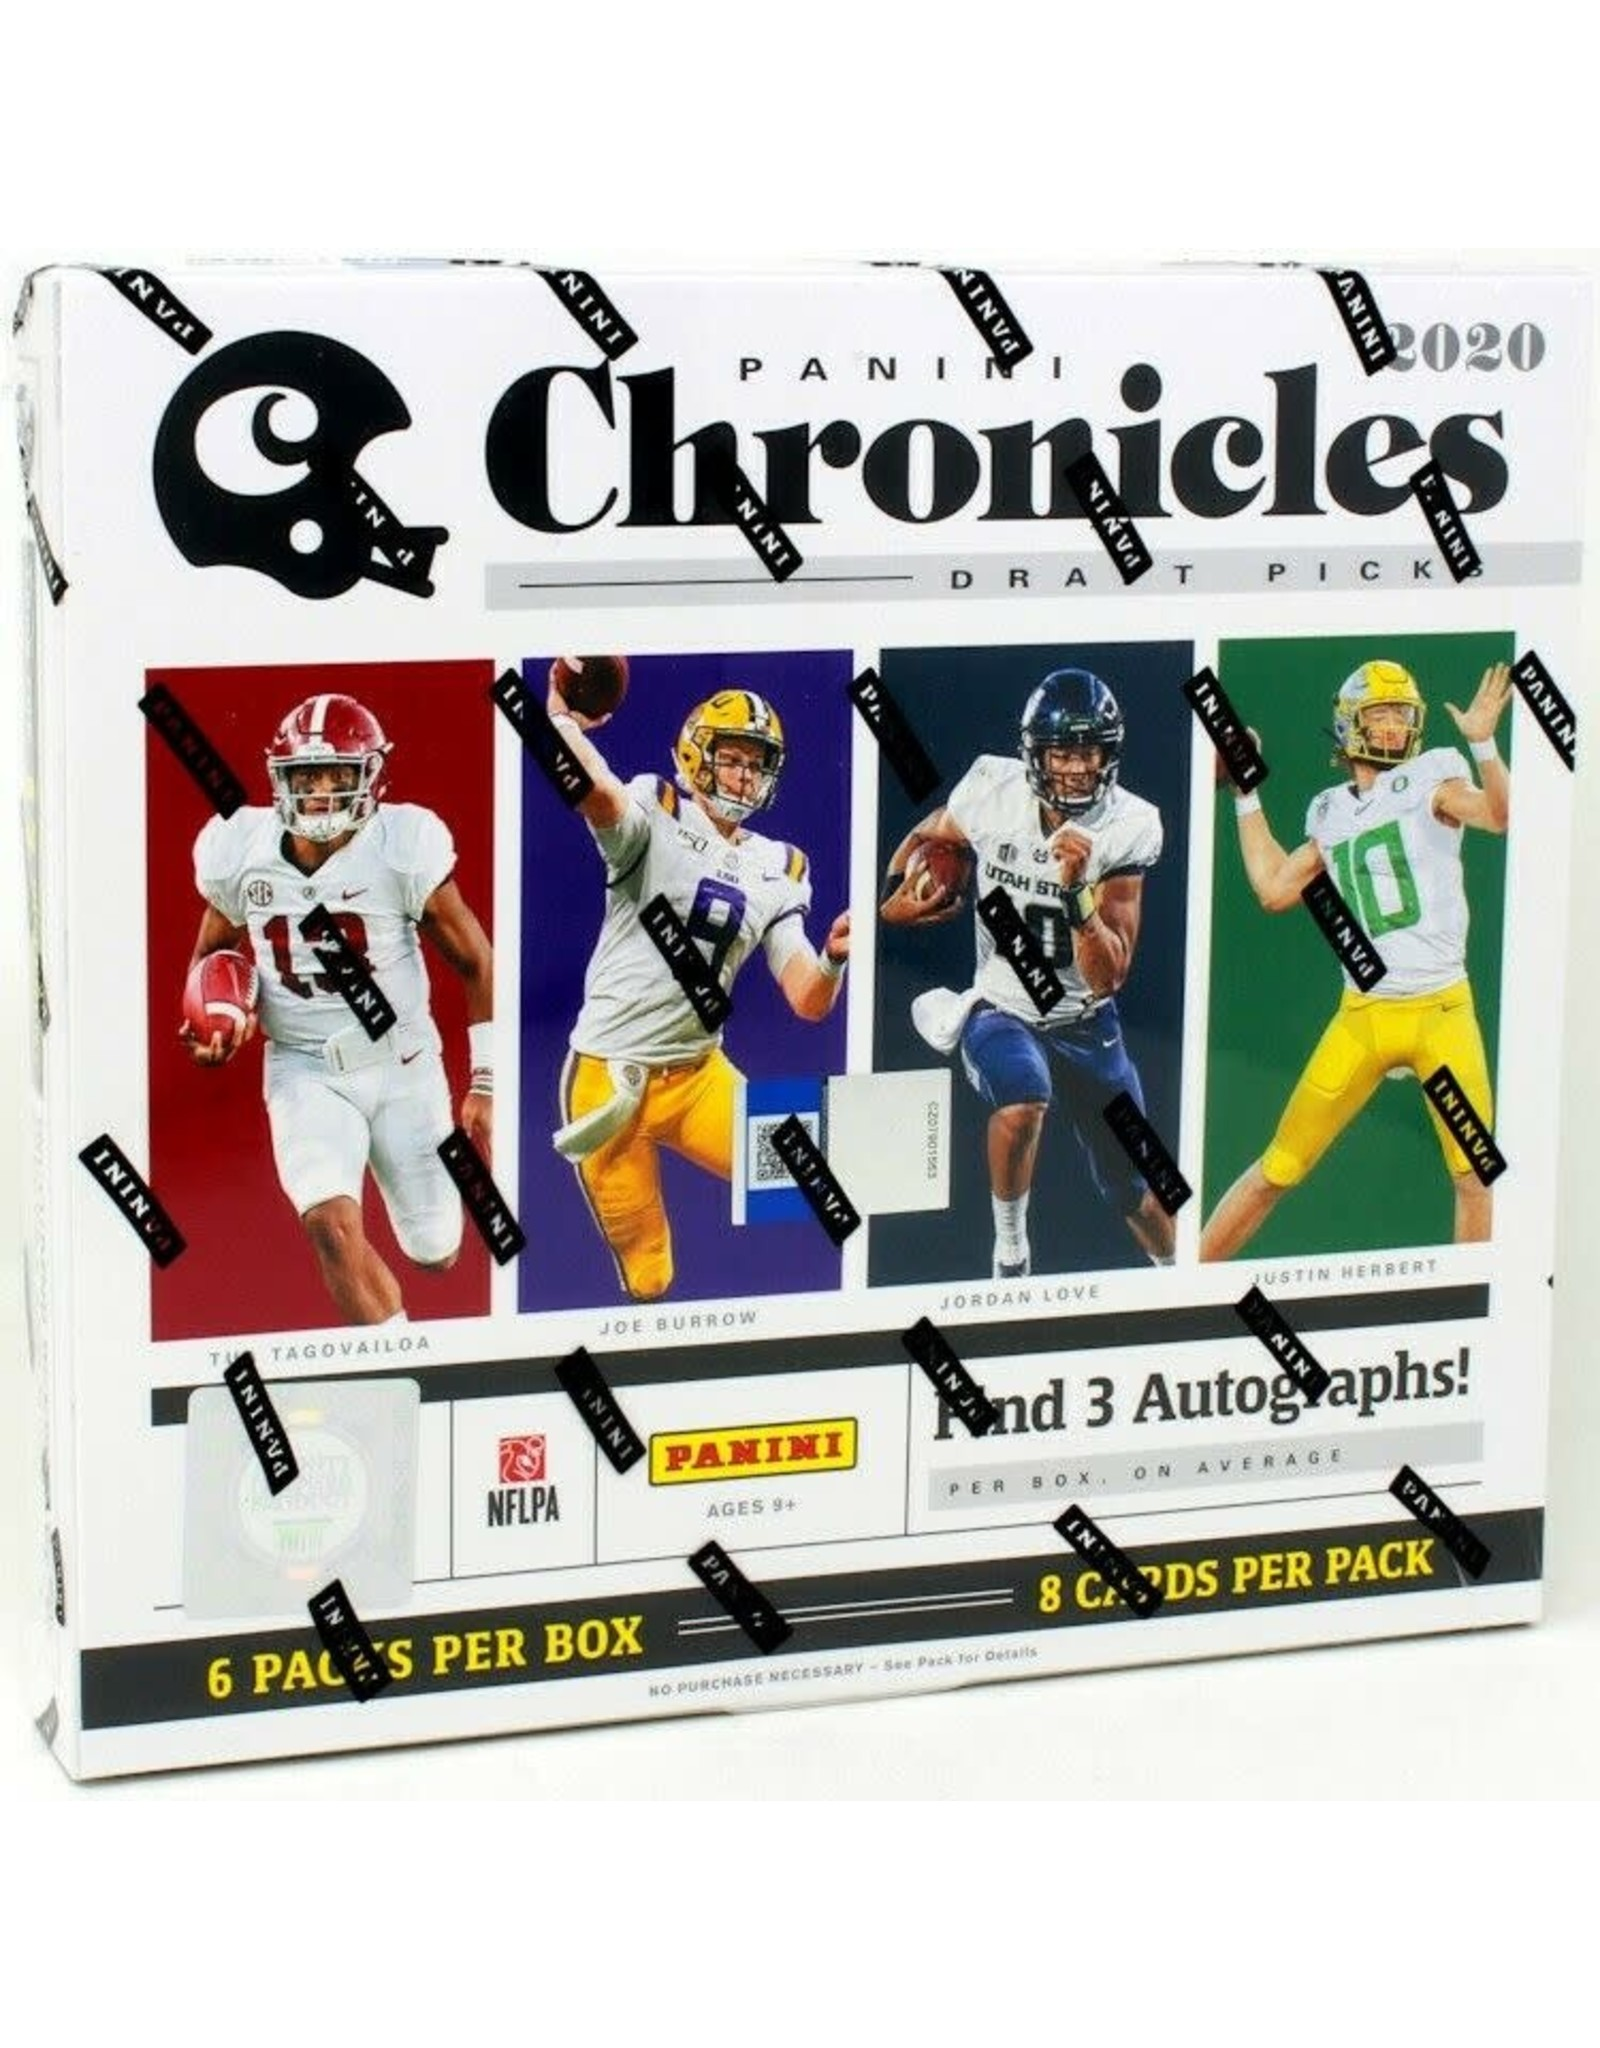 Panini 2020 Panini Chronicles Draft Picks Football Hobby Box